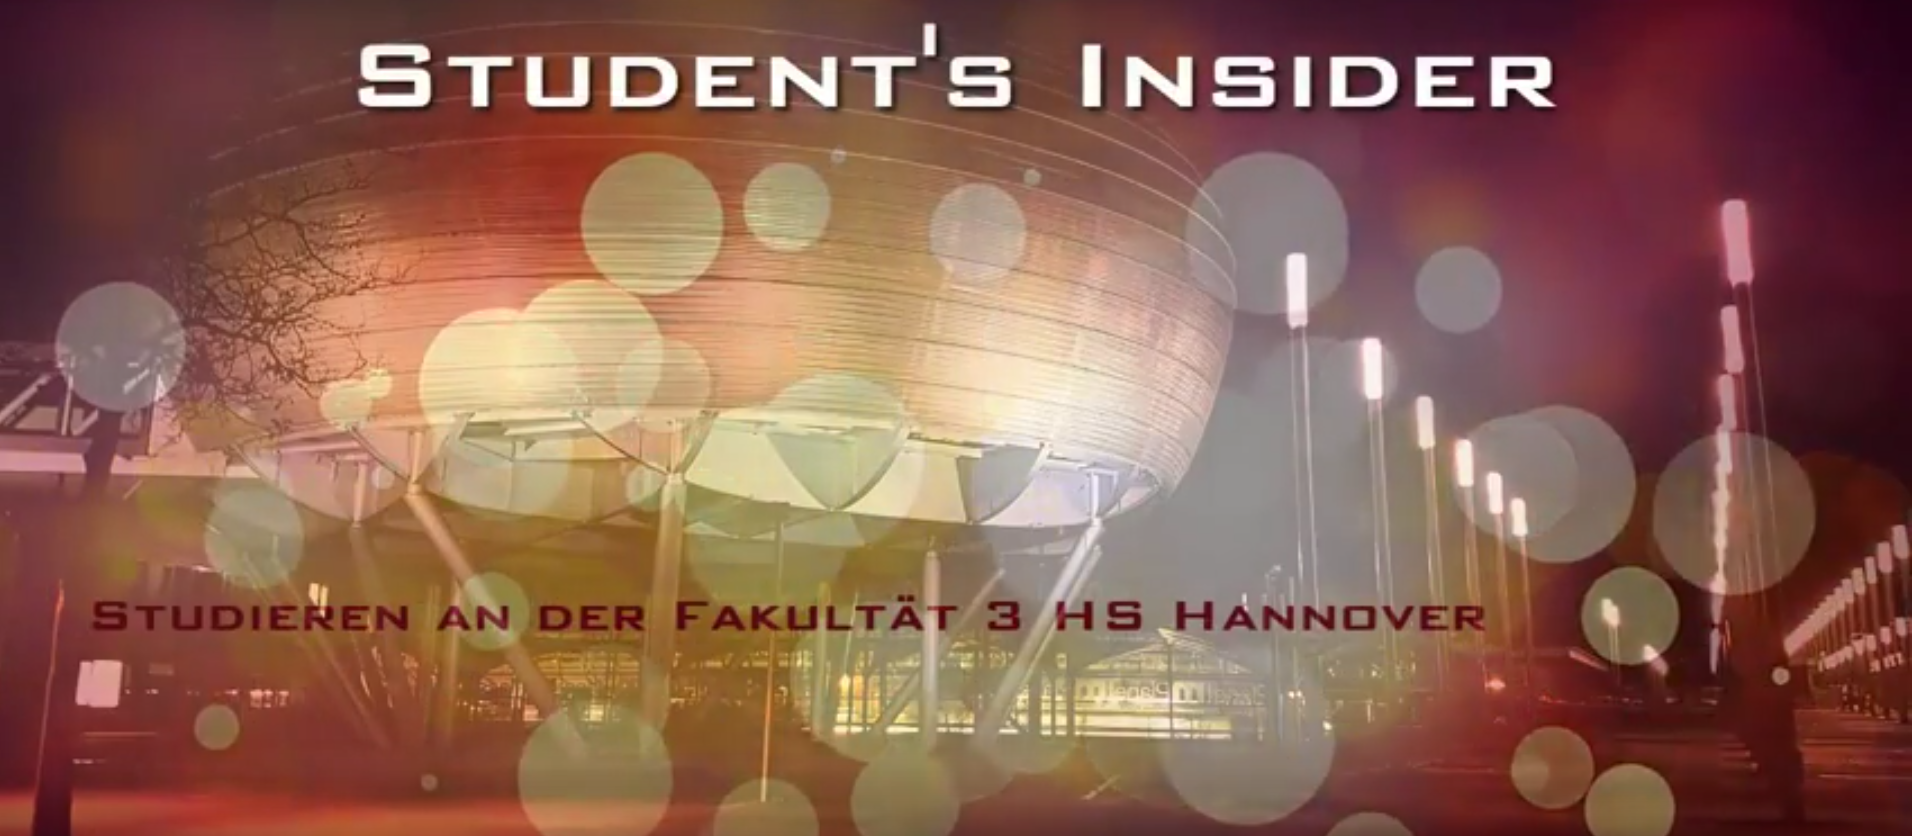 Students Insider